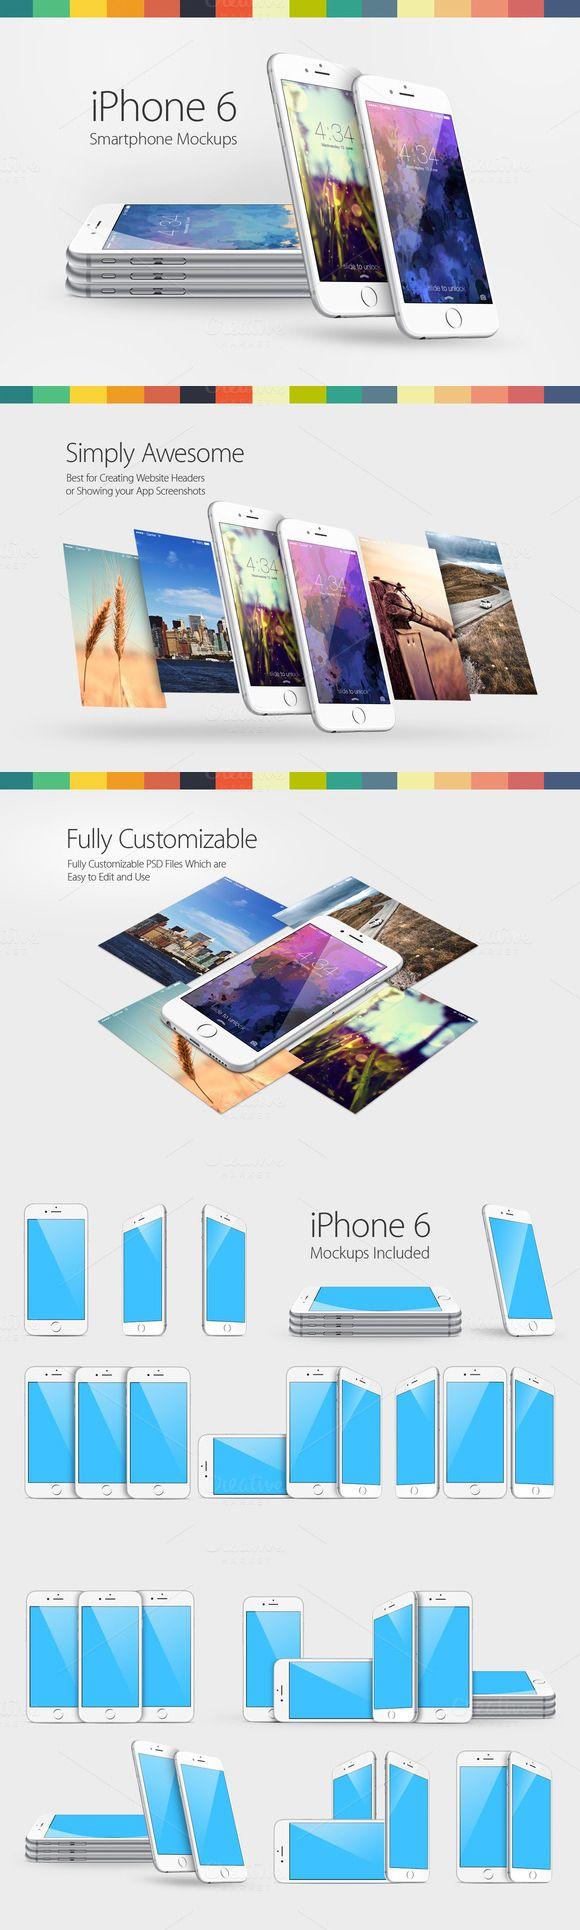 iPhone 6 Mockups #iphonemockup #iphone6mockup Download: https://creativemarket.com/YD-LABS/114628-iPhone-6-Mockups?u=ksioks